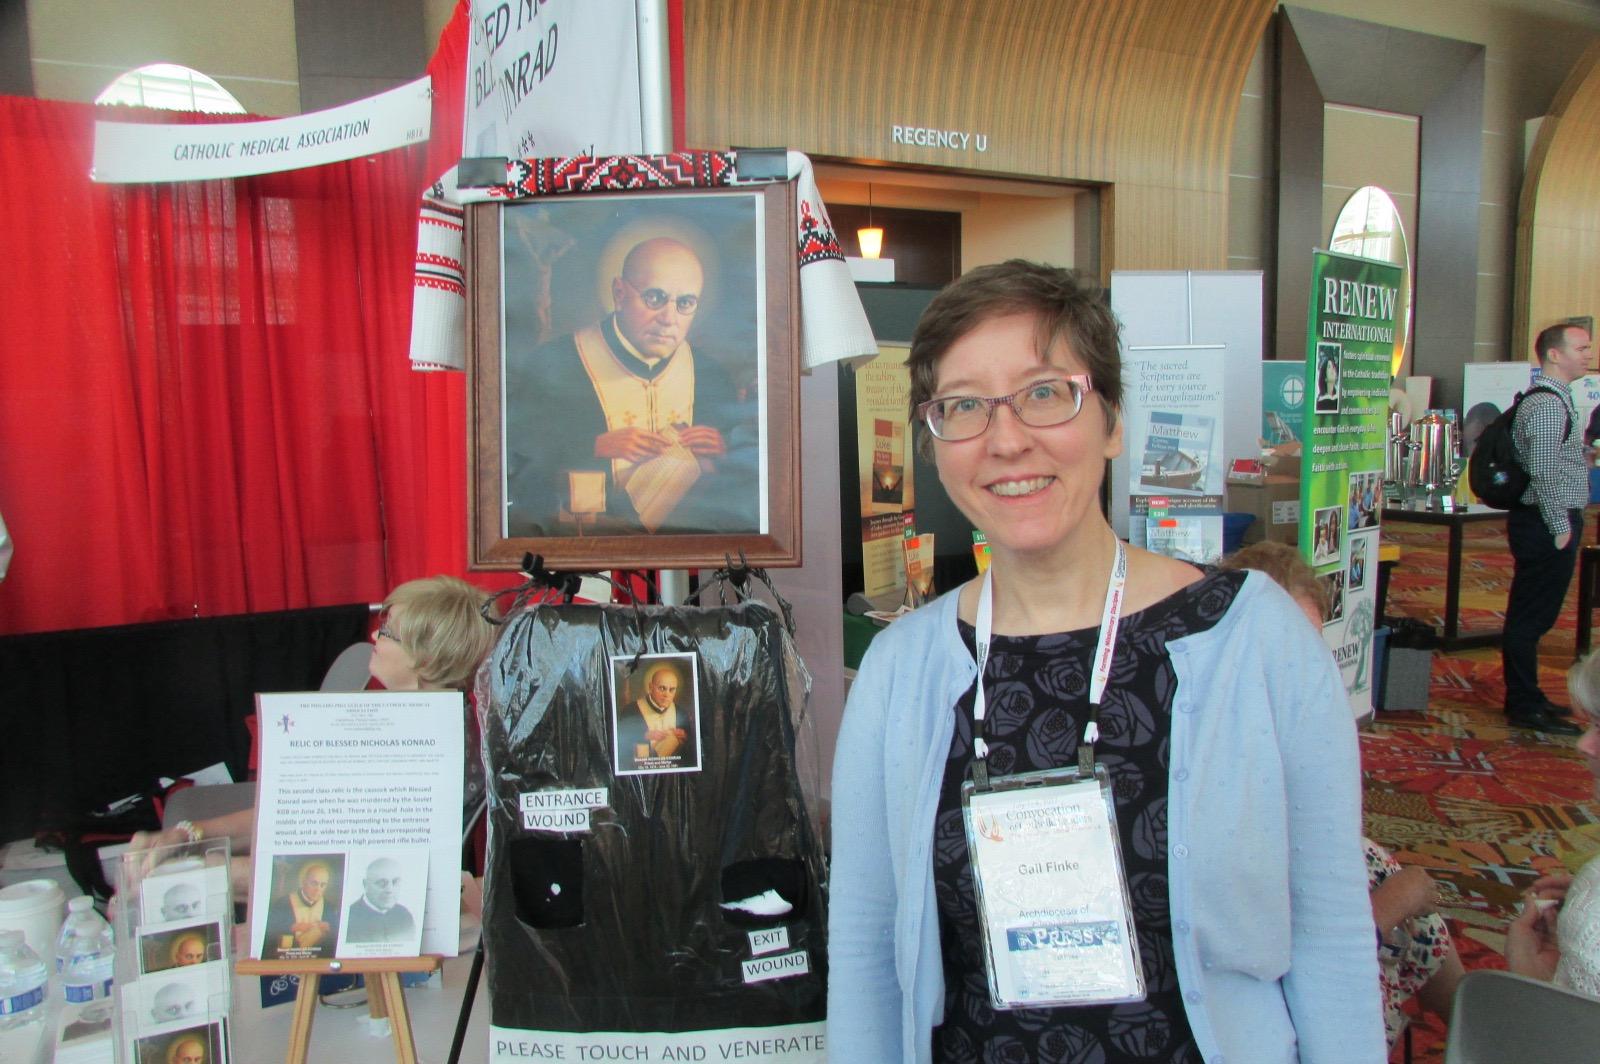 Writer/photographer Gail Finke with the portrait of Bl. Nicholas Konrad. (CT Photo)